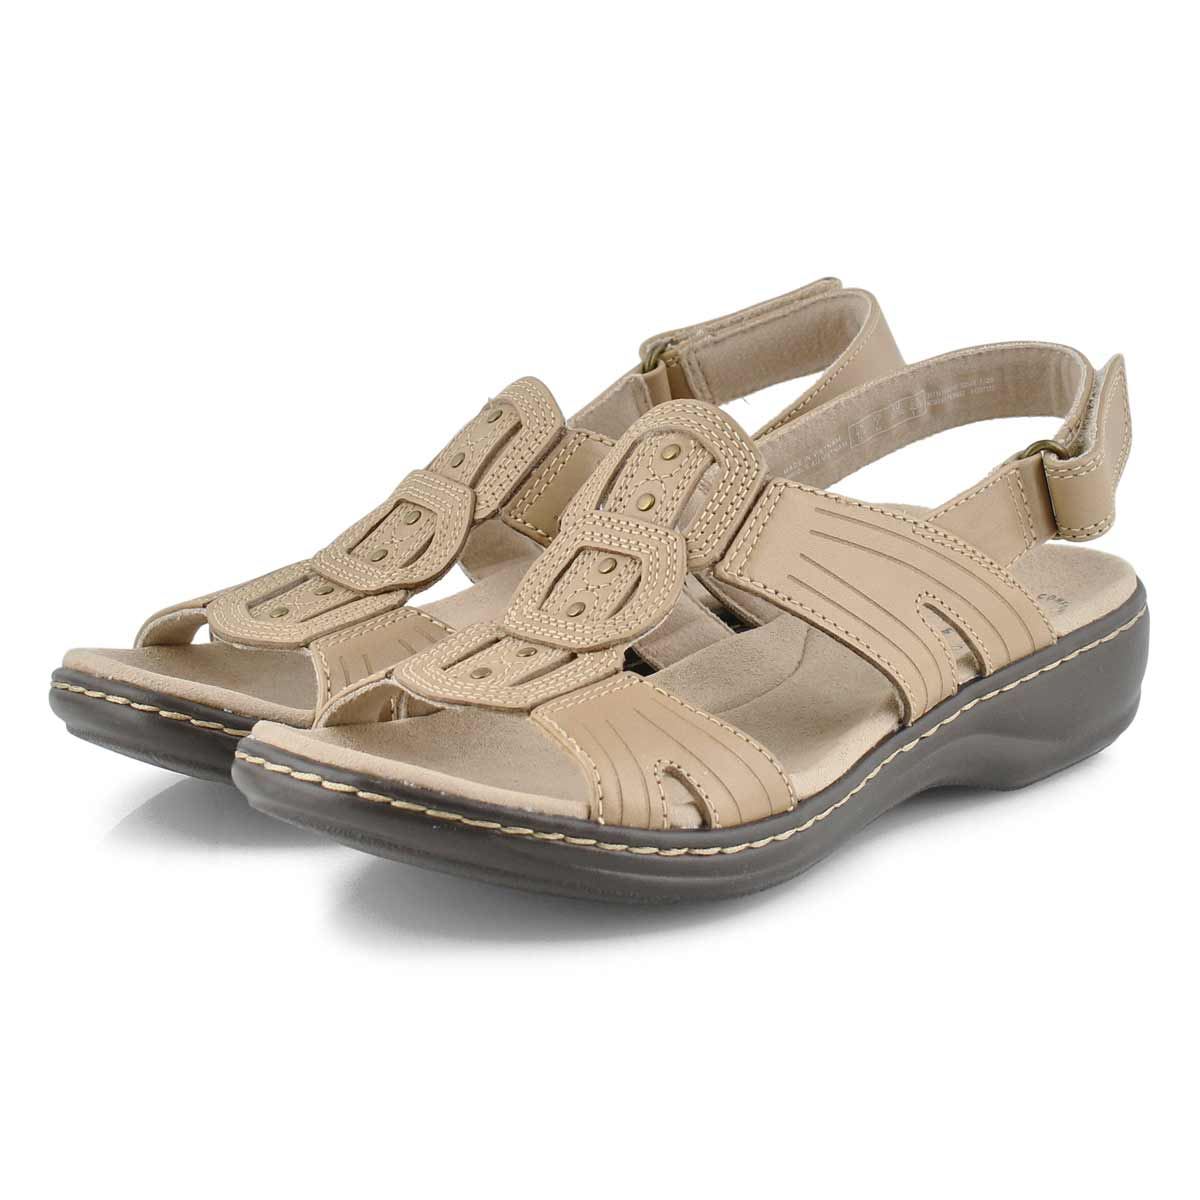 Lds Leisa Vine sand casual sandal